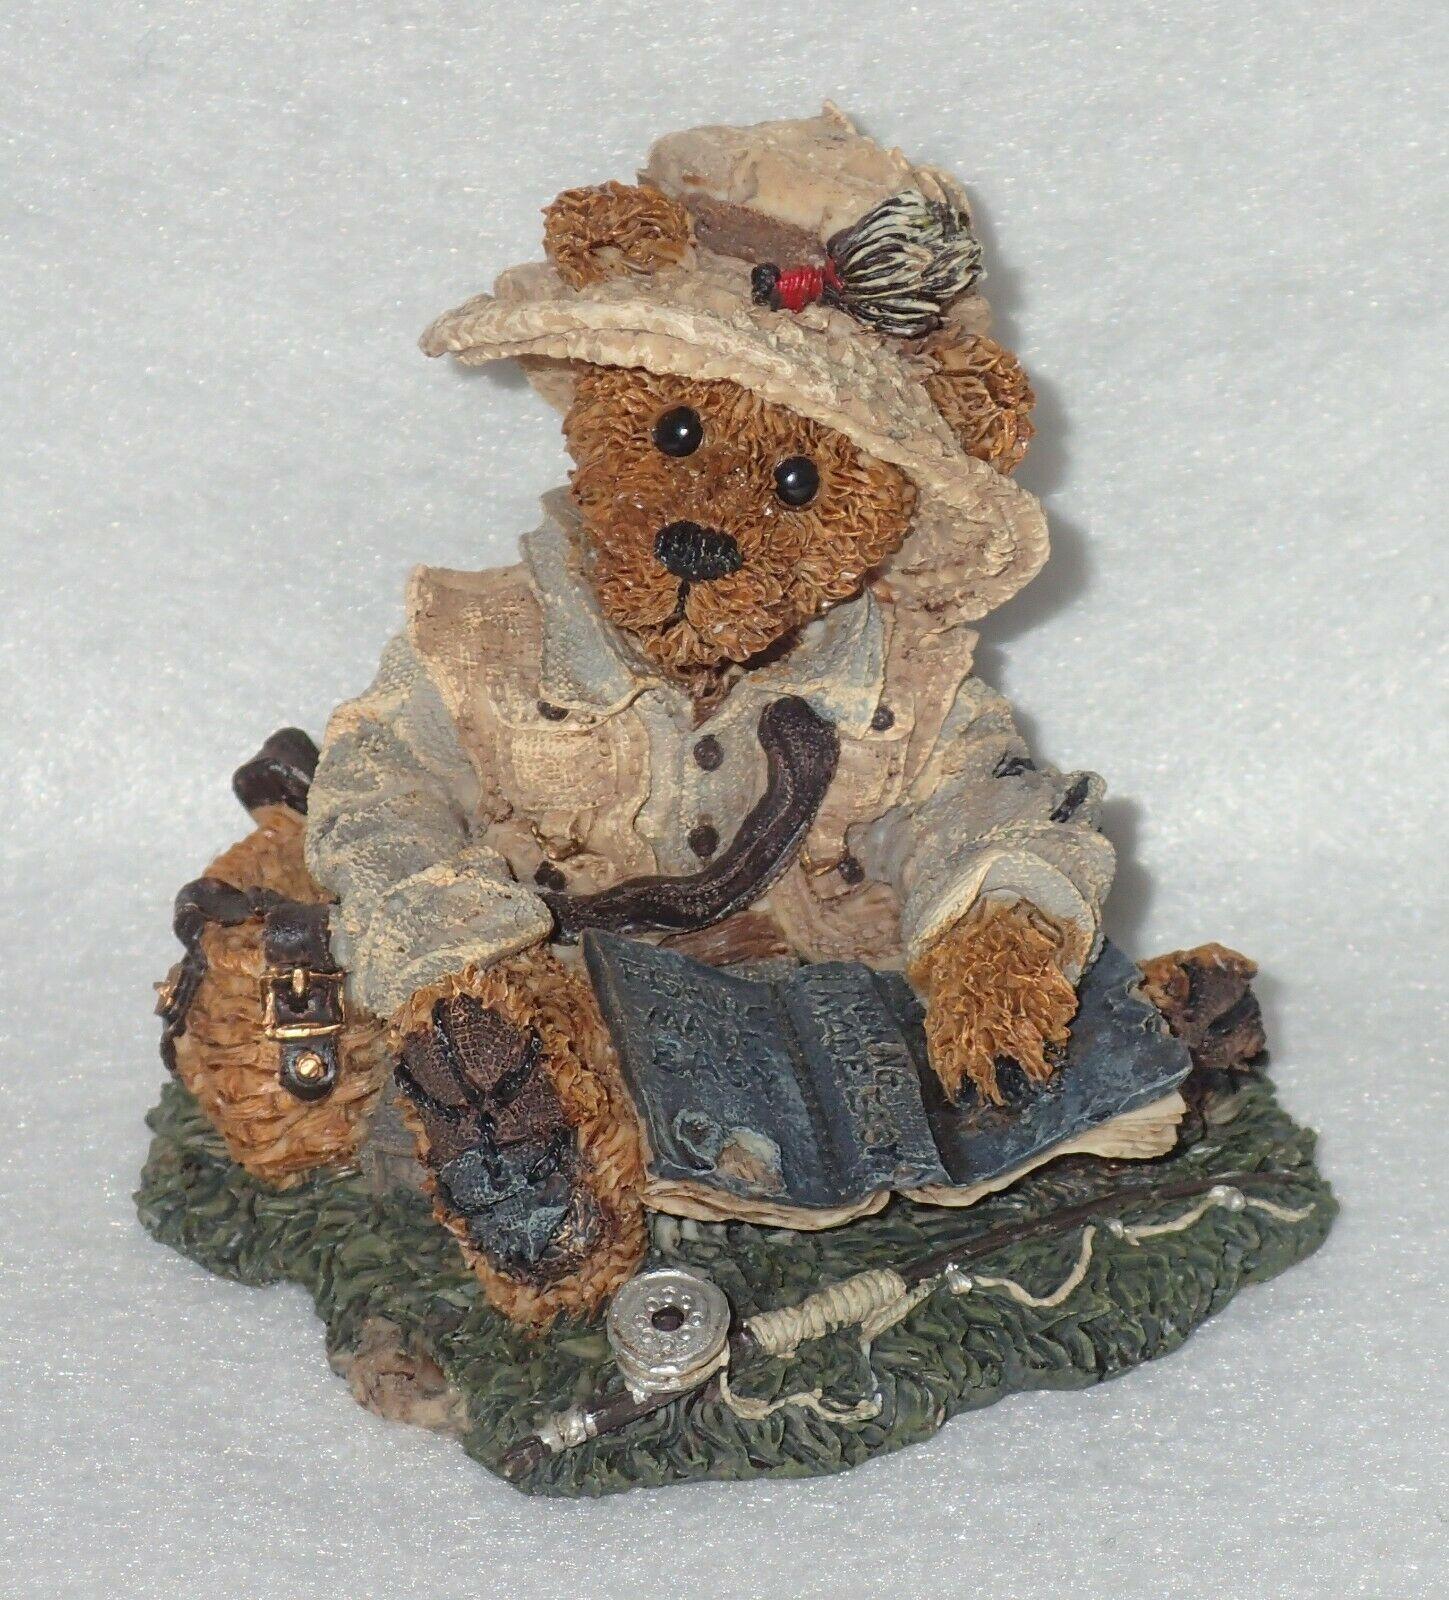 Boyd Bearstone Resin Bears Otis The Fisherman Figurine #2249-06 5E NEW IN BOX